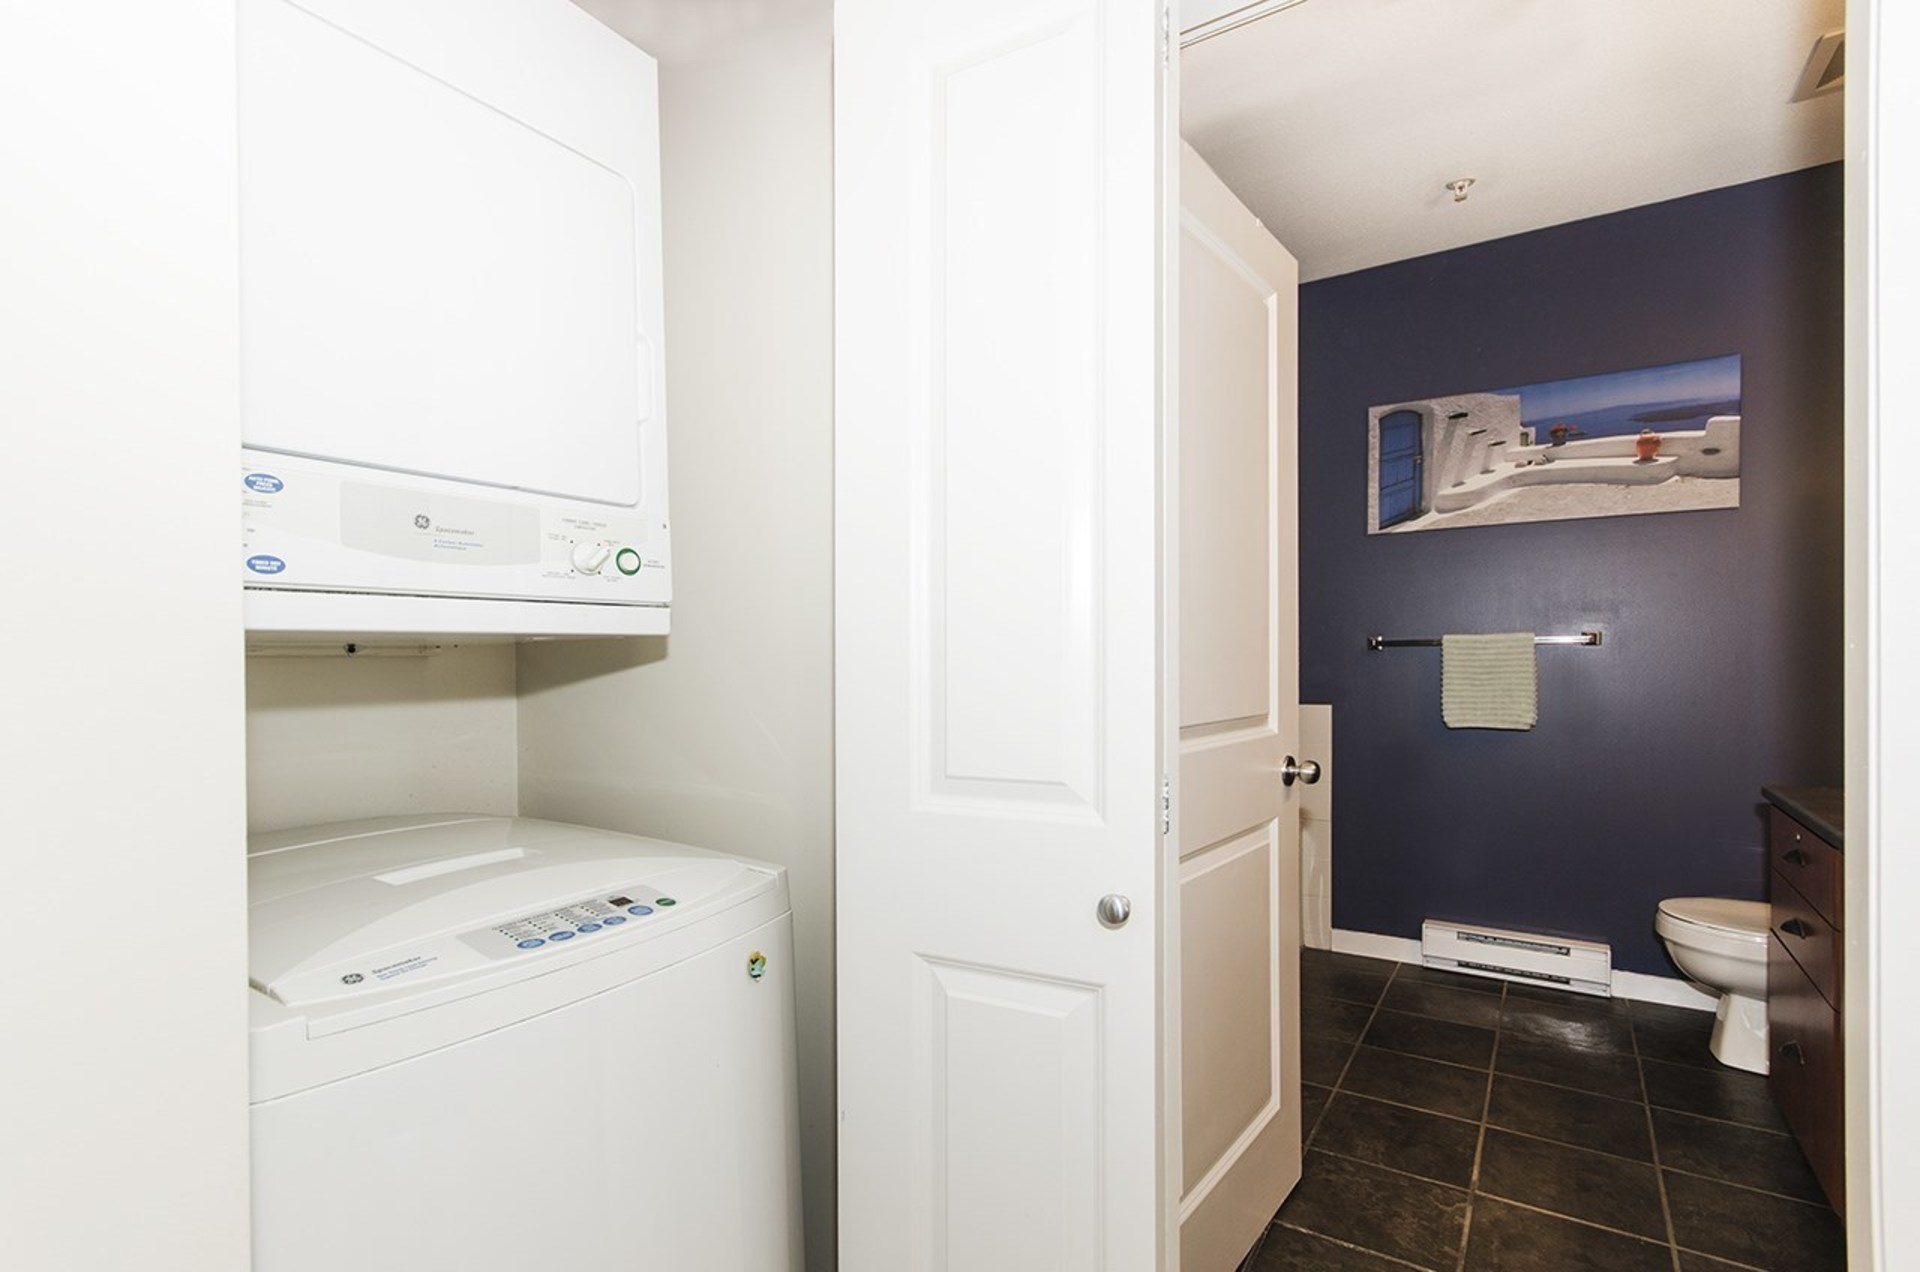 6508-denbigh-avenue-forest-glen-bs-burnaby-south-14 at 318 - 6508 Denbigh Avenue, Forest Glen BS, Burnaby South